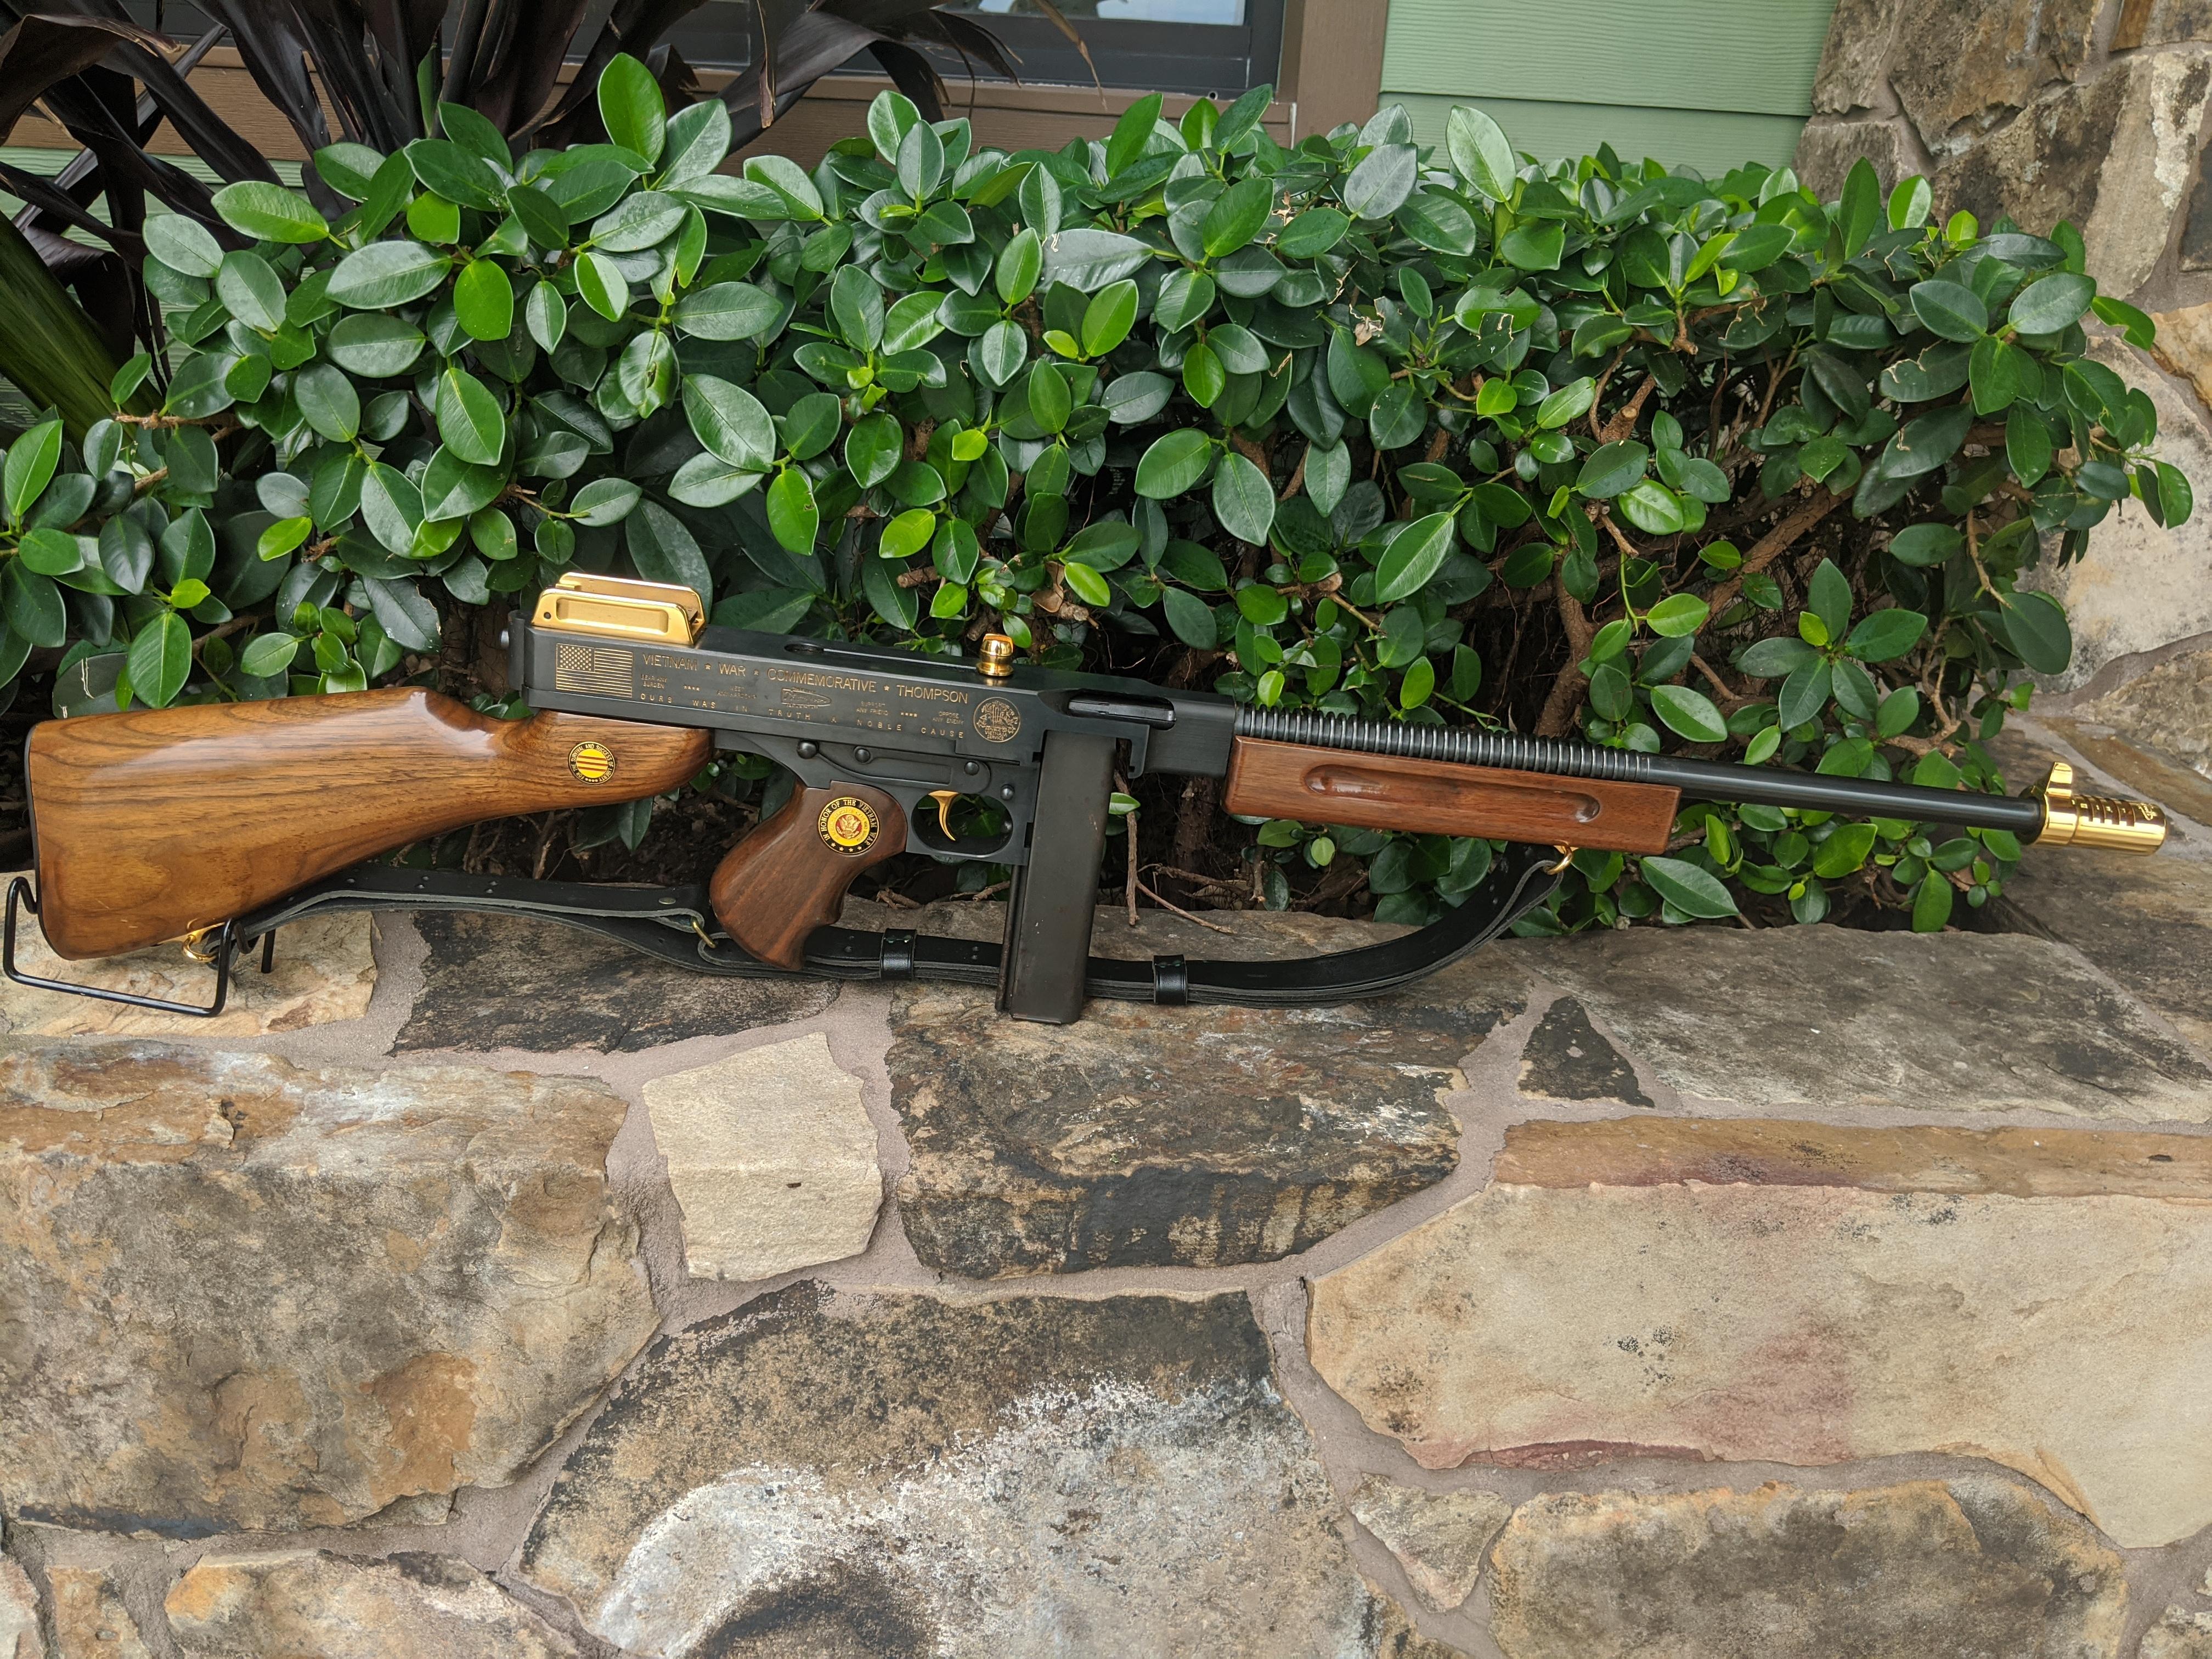 AUTO-ORDNANCE Vietnam War Commemorative Thompson